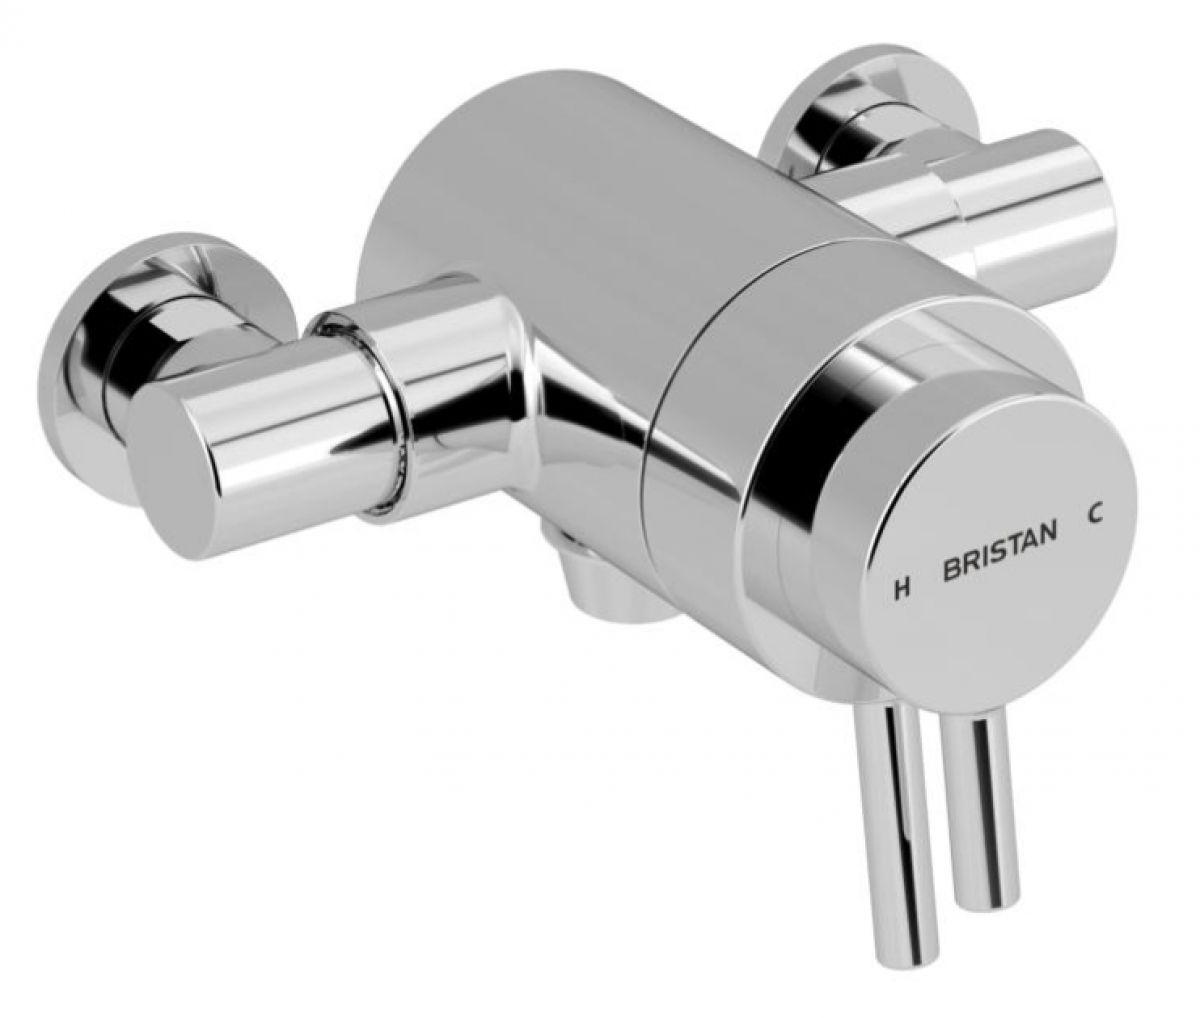 Prism Exposed Concentric Chrome Shower Valve Uk Bathrooms